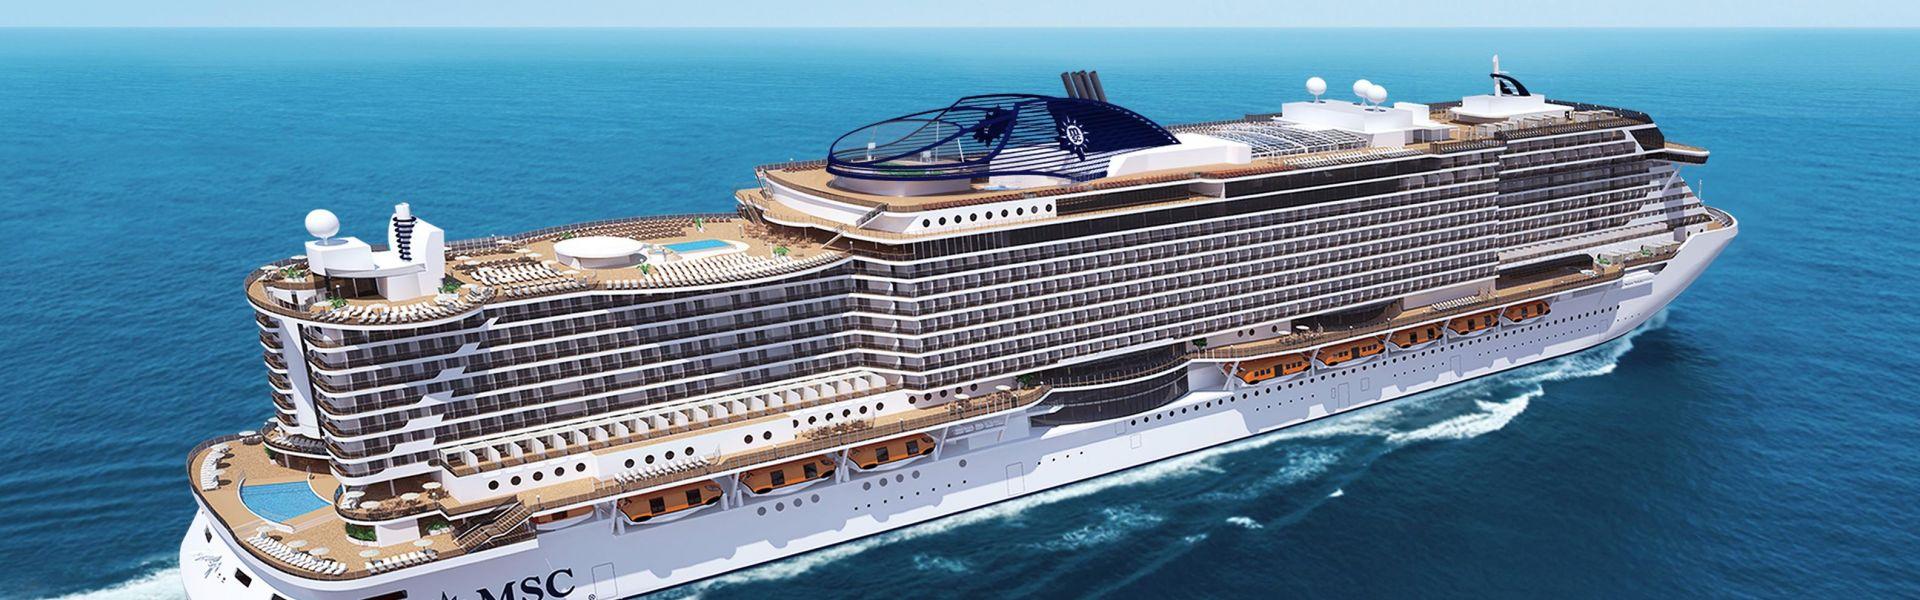 Croaziera 2018 - Caraibe de Est (Miami) - MSC Cruises - MSC Seaside - 7 nopti